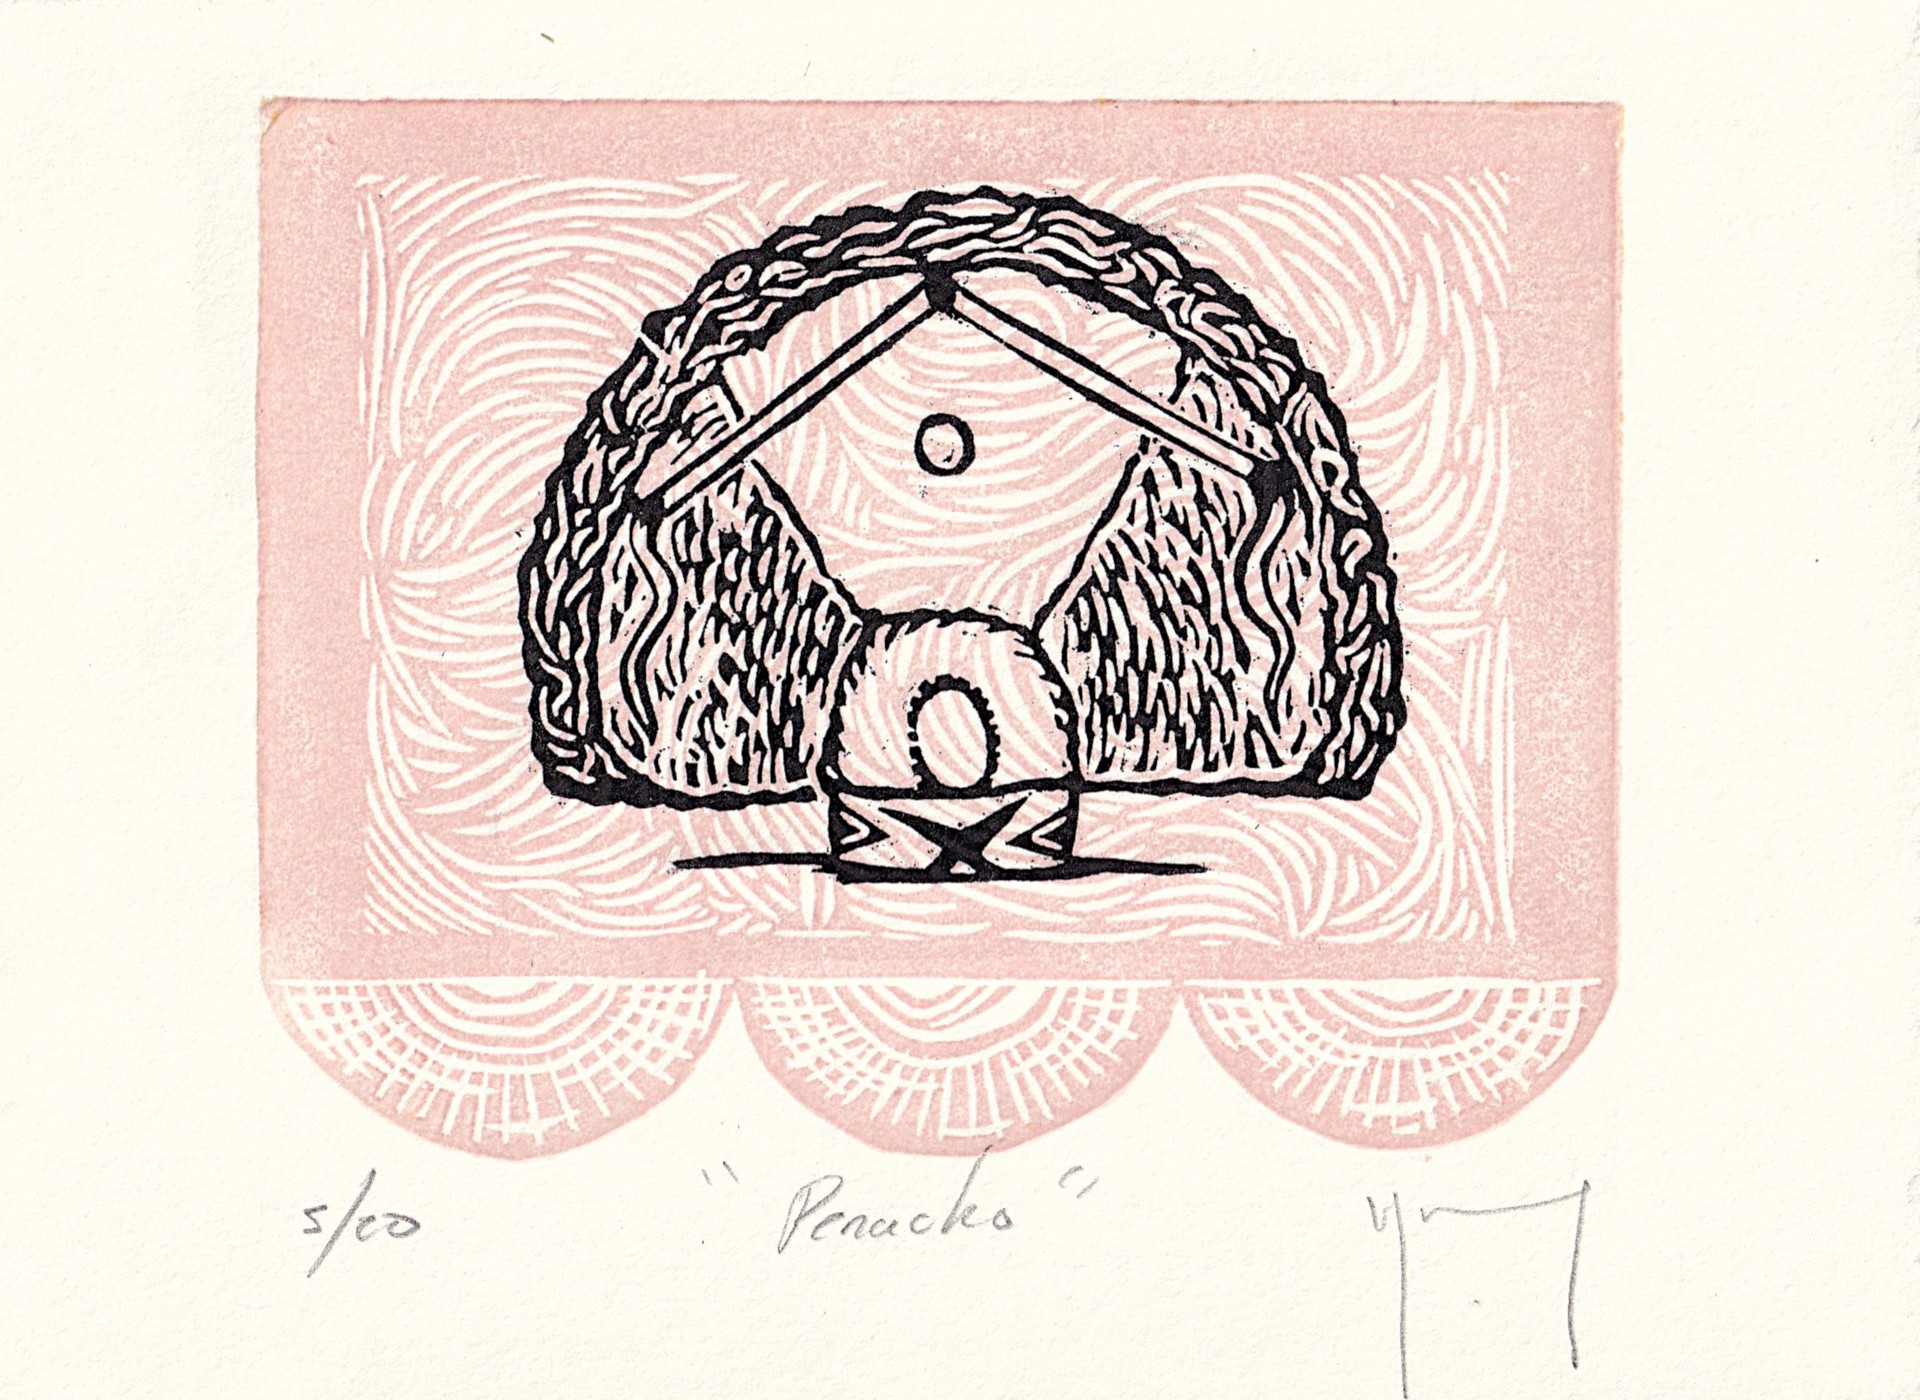 Serie Oaxaca (Penacho) by Miguel Jimenez Martinez